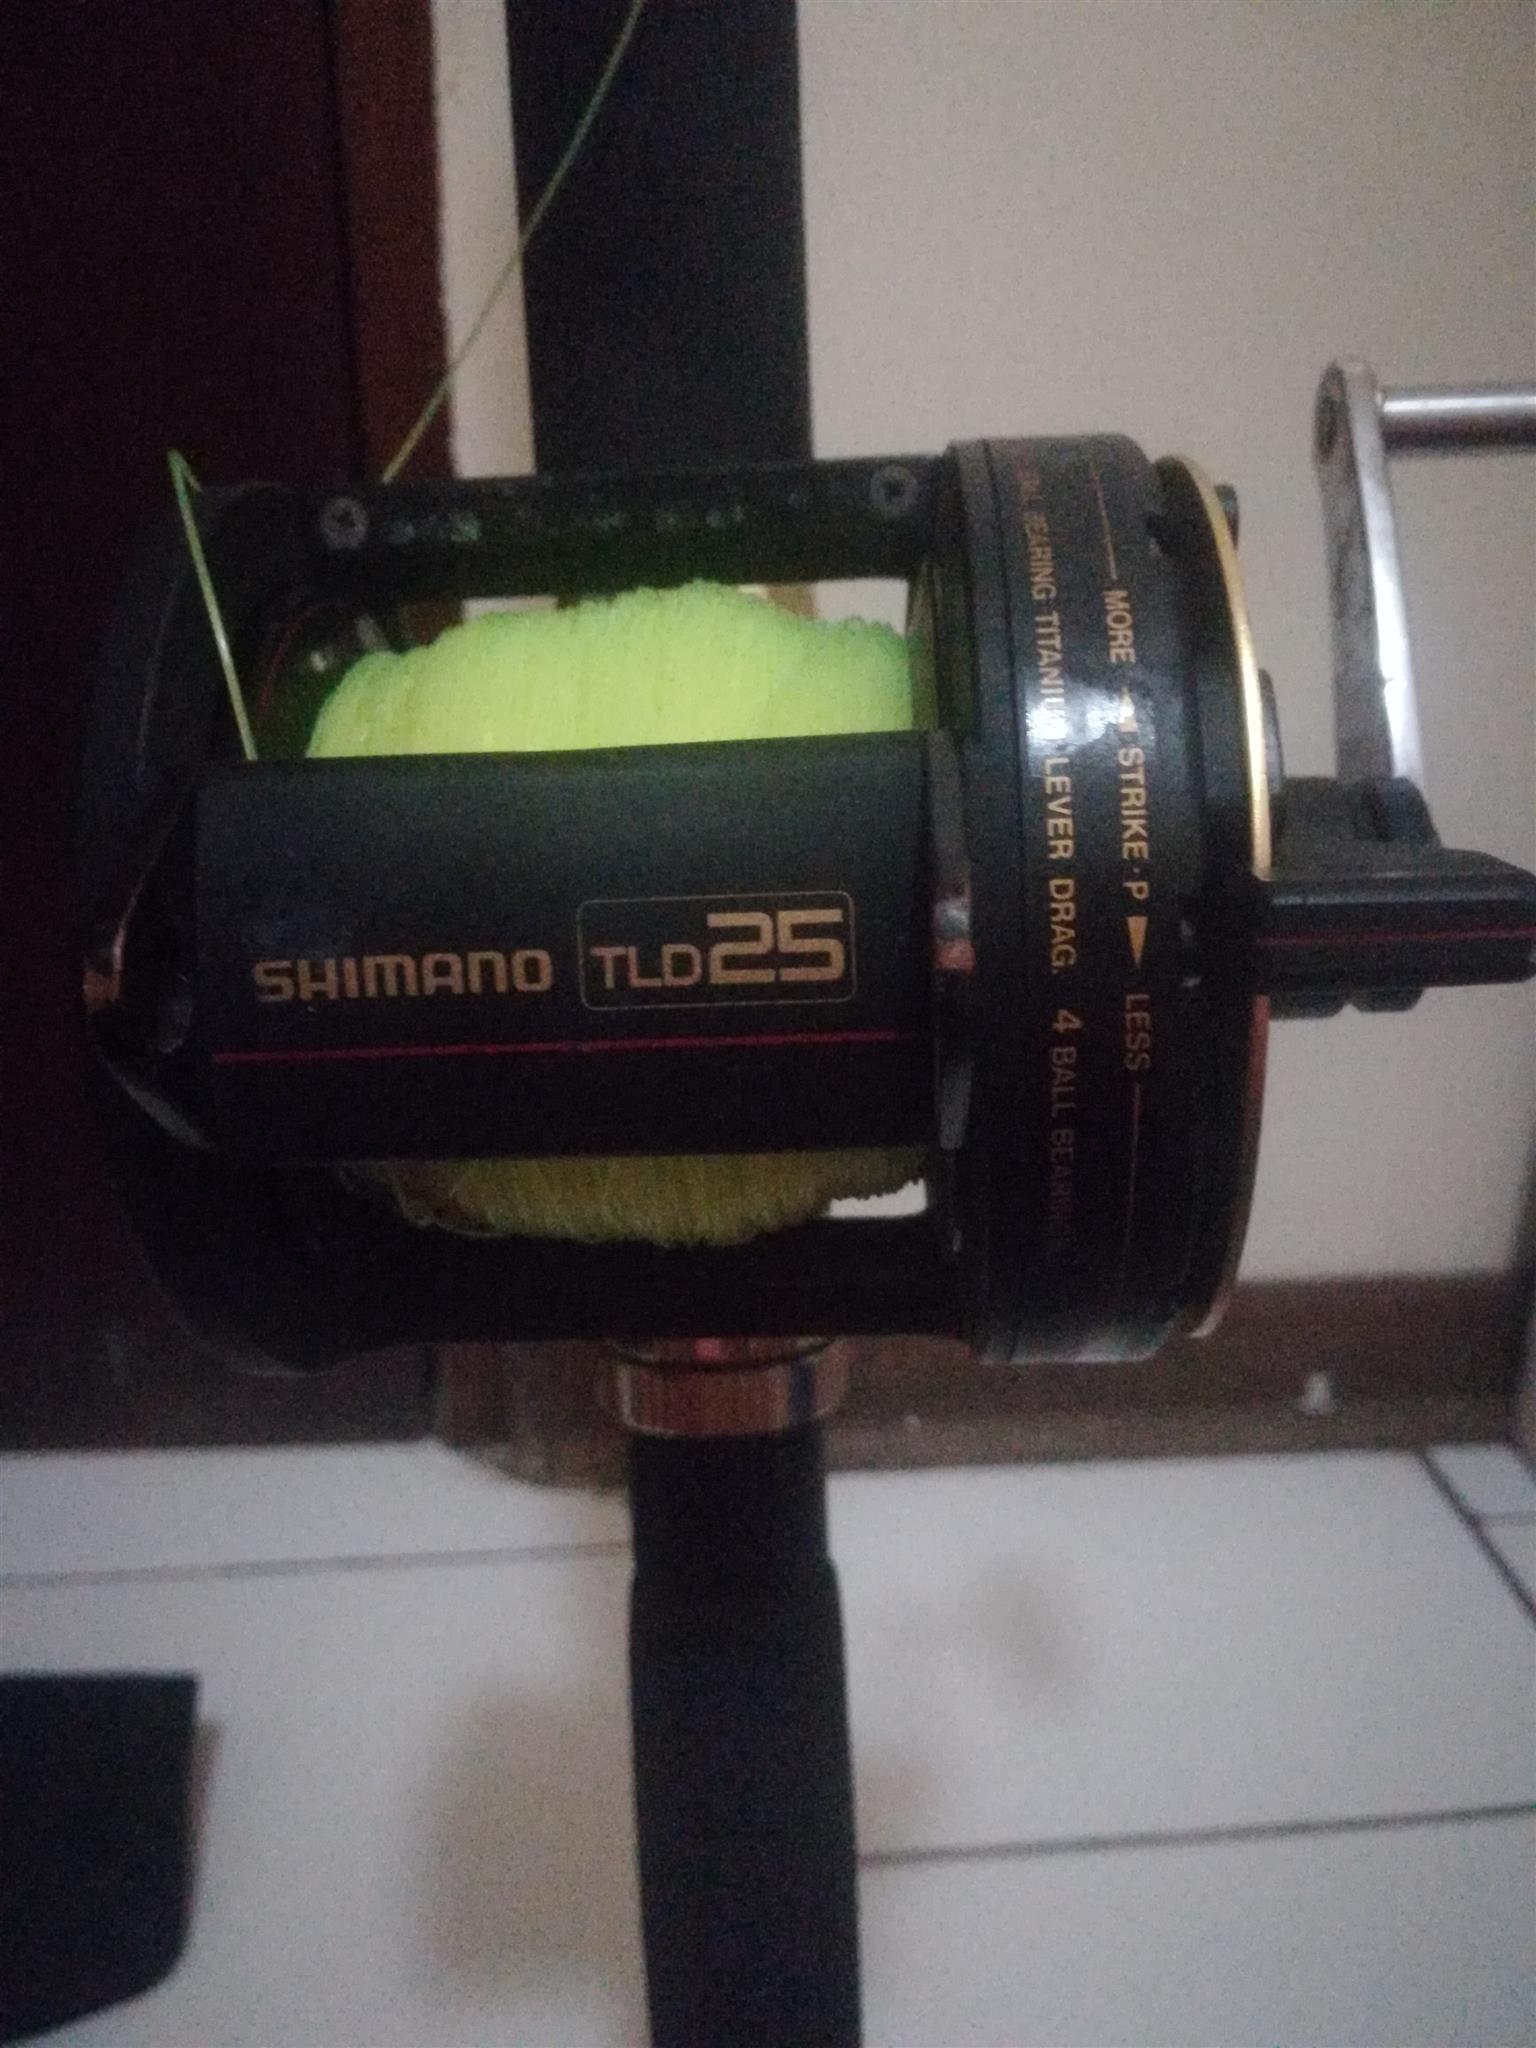 Shimano Tiagra B Stand Up 3050 Deep Sea Fishing Rod